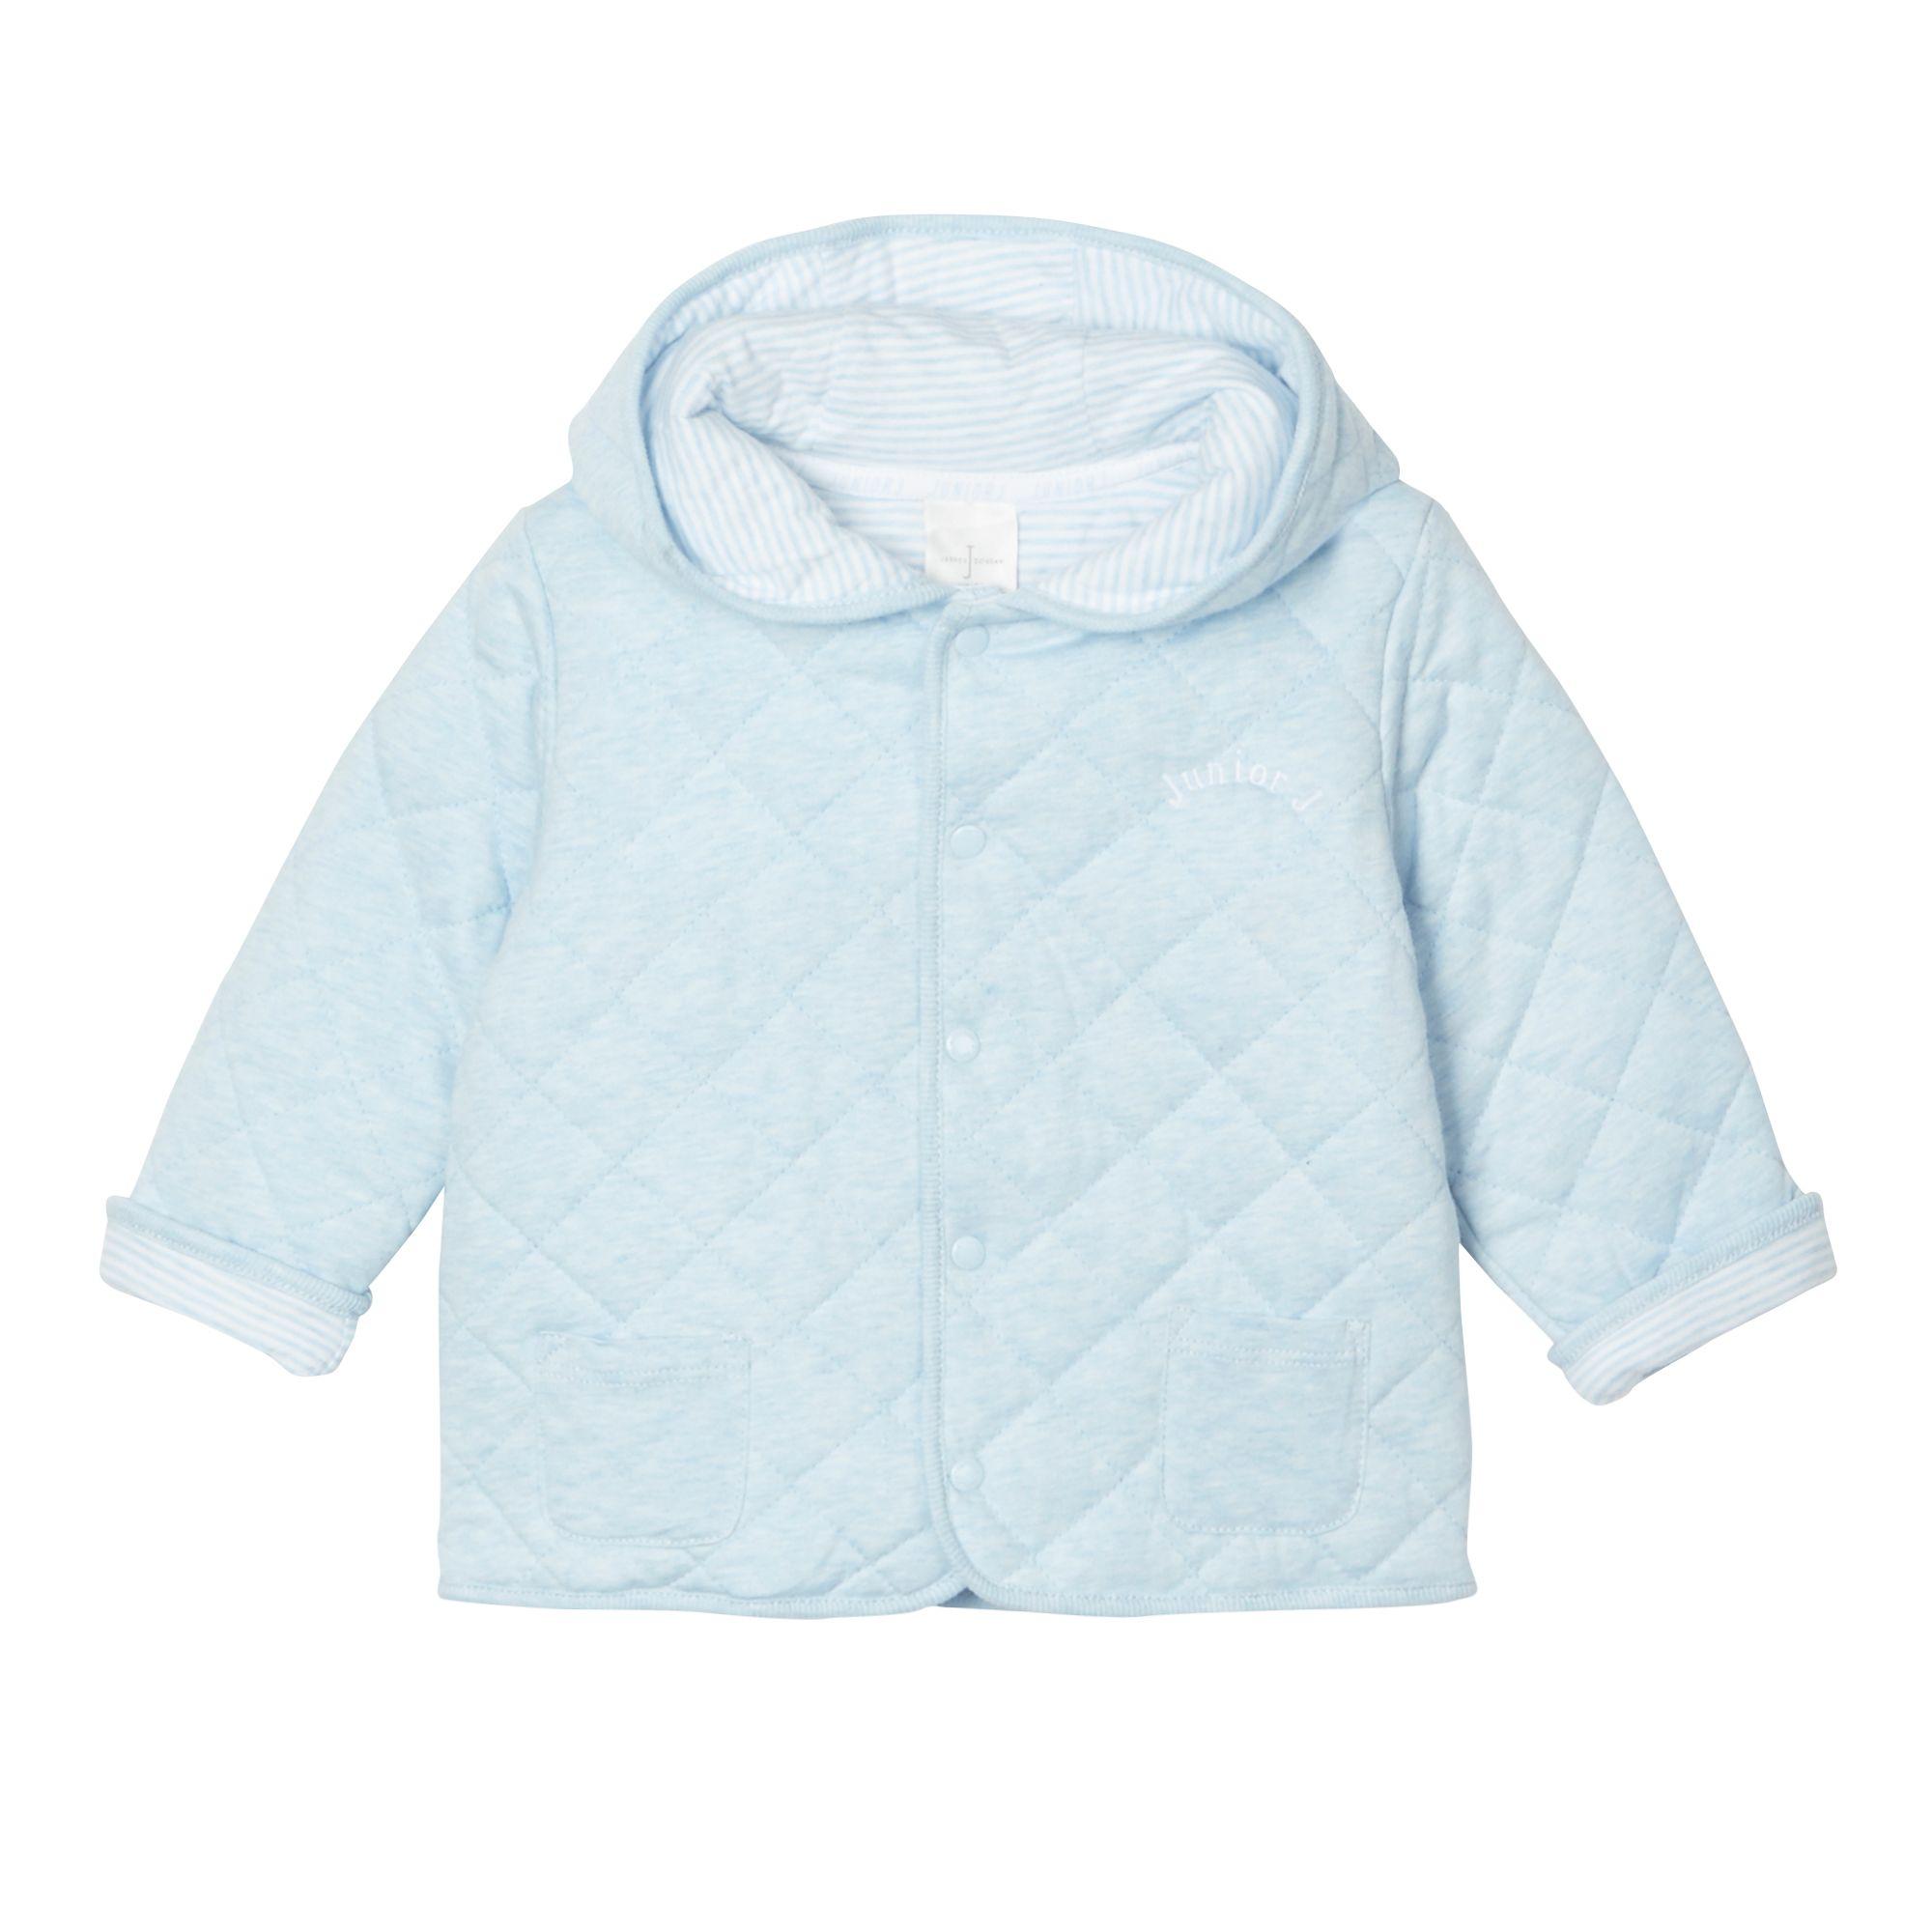 Baby Boy Gifts Debenhams : J by jasper conran kids designer babies pale blue quilted